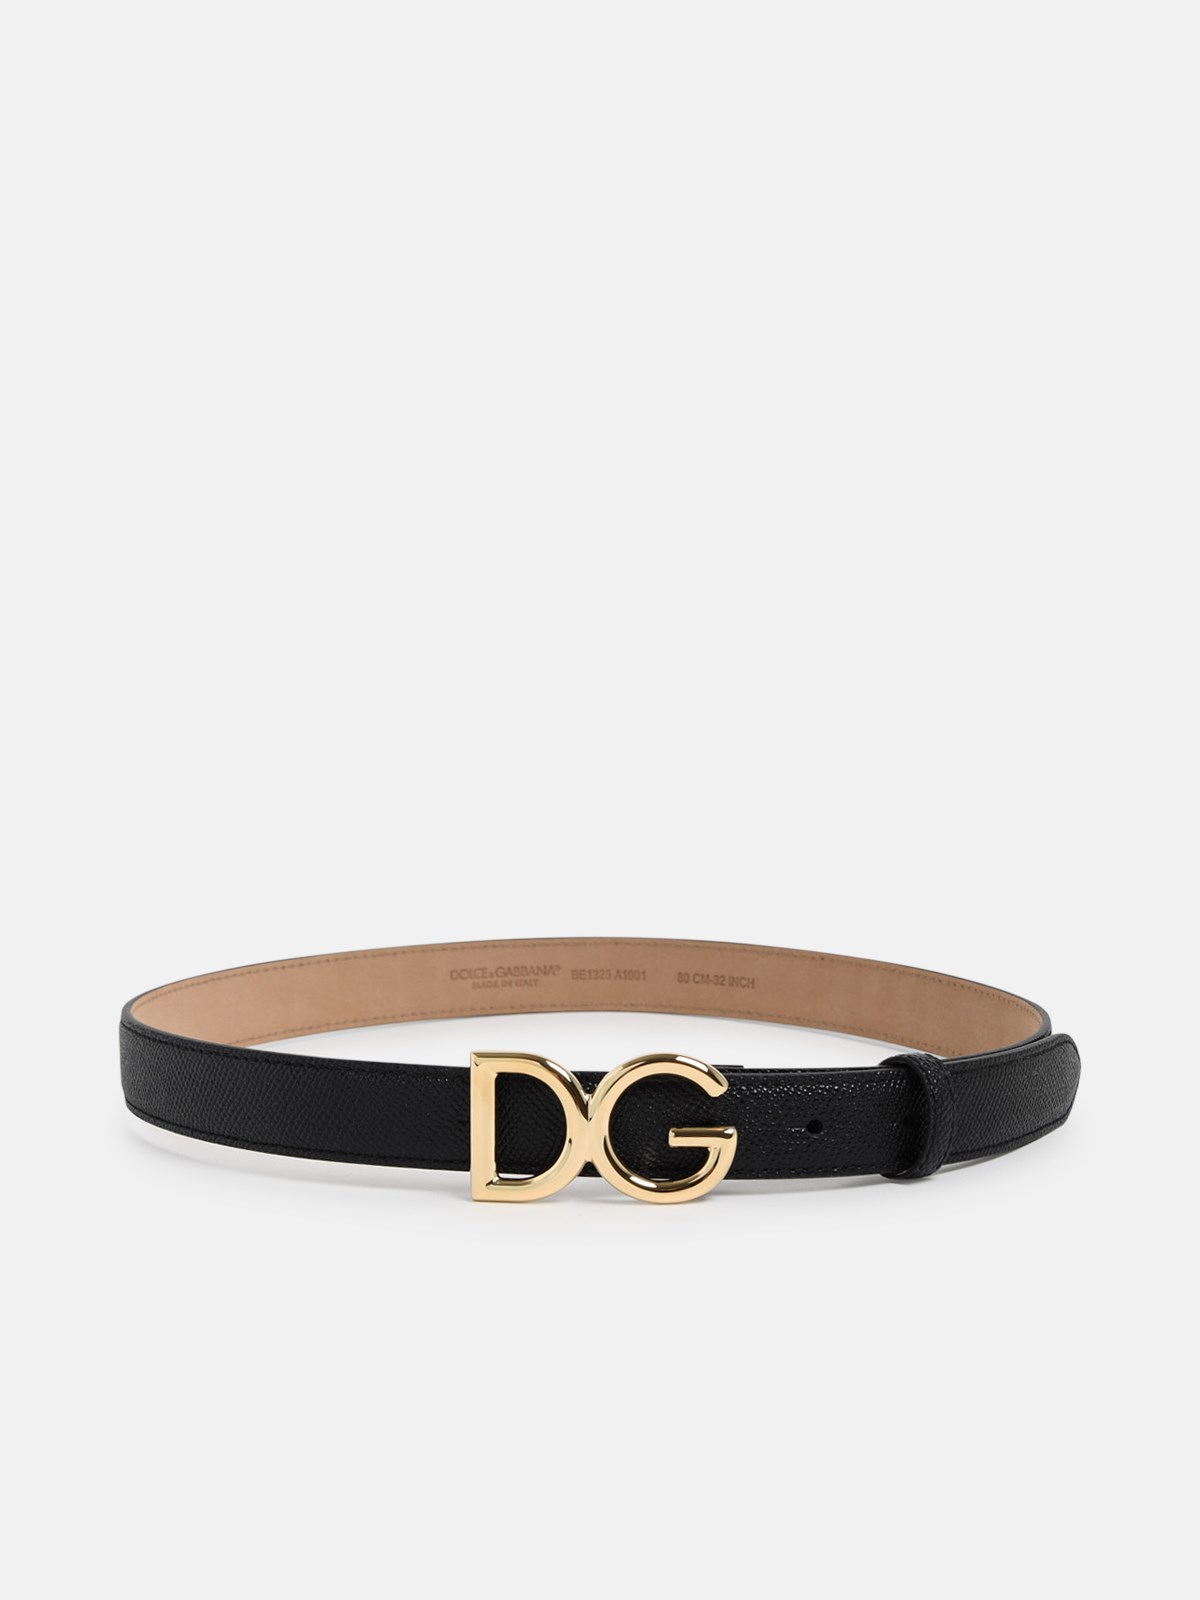 Dolce & Gabbana BLACK LOW BELT